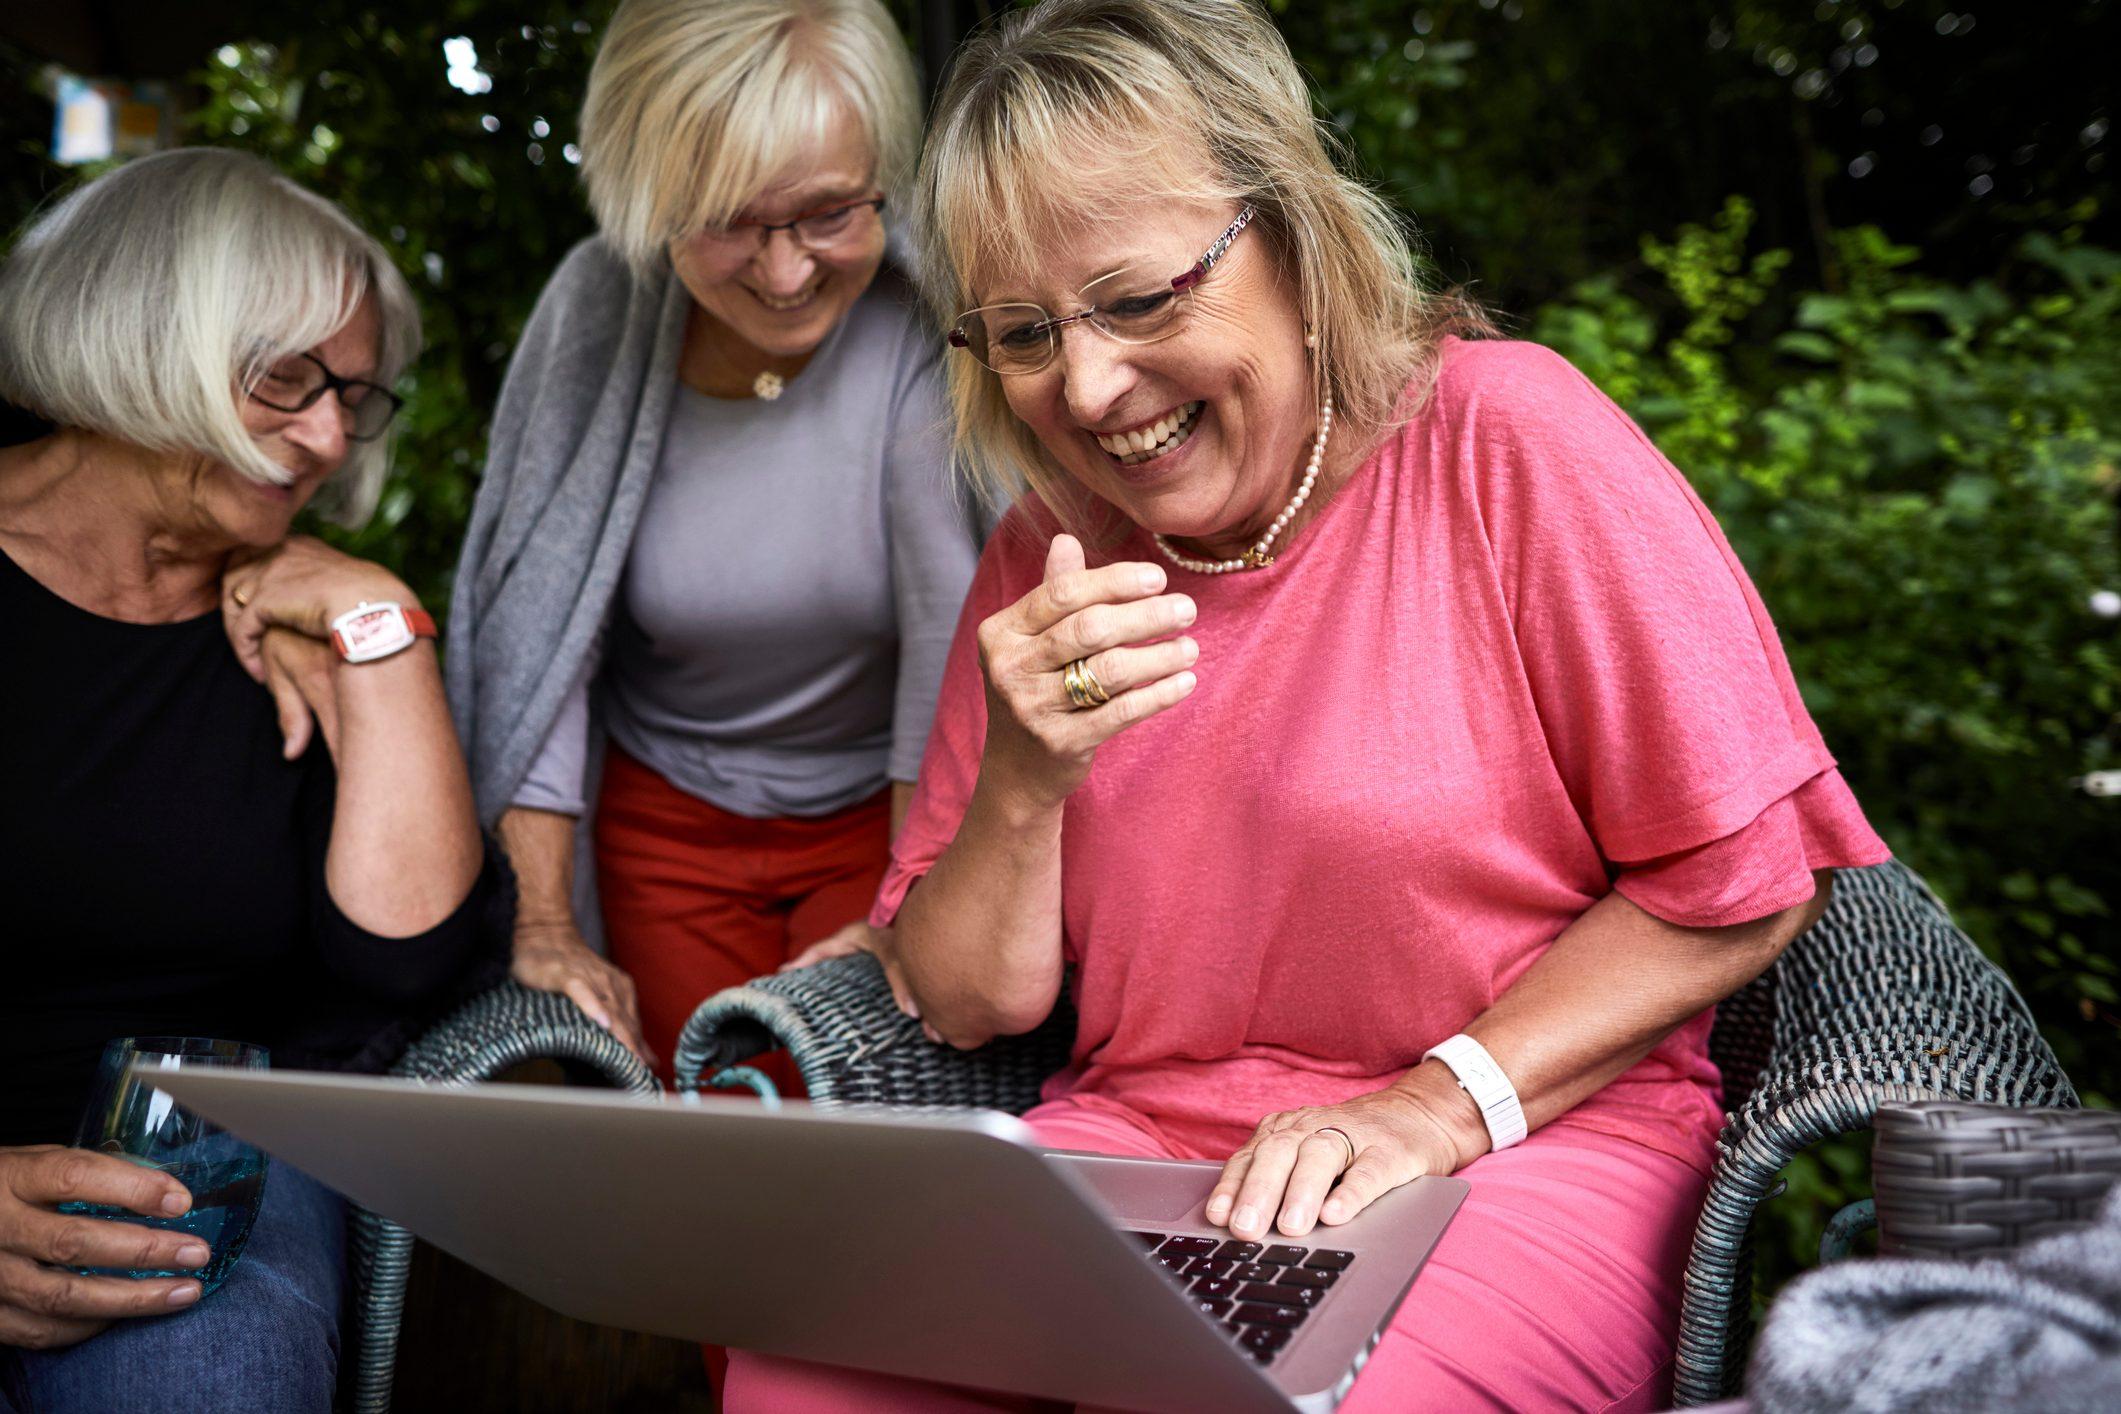 Happy senior women using laptop in garden